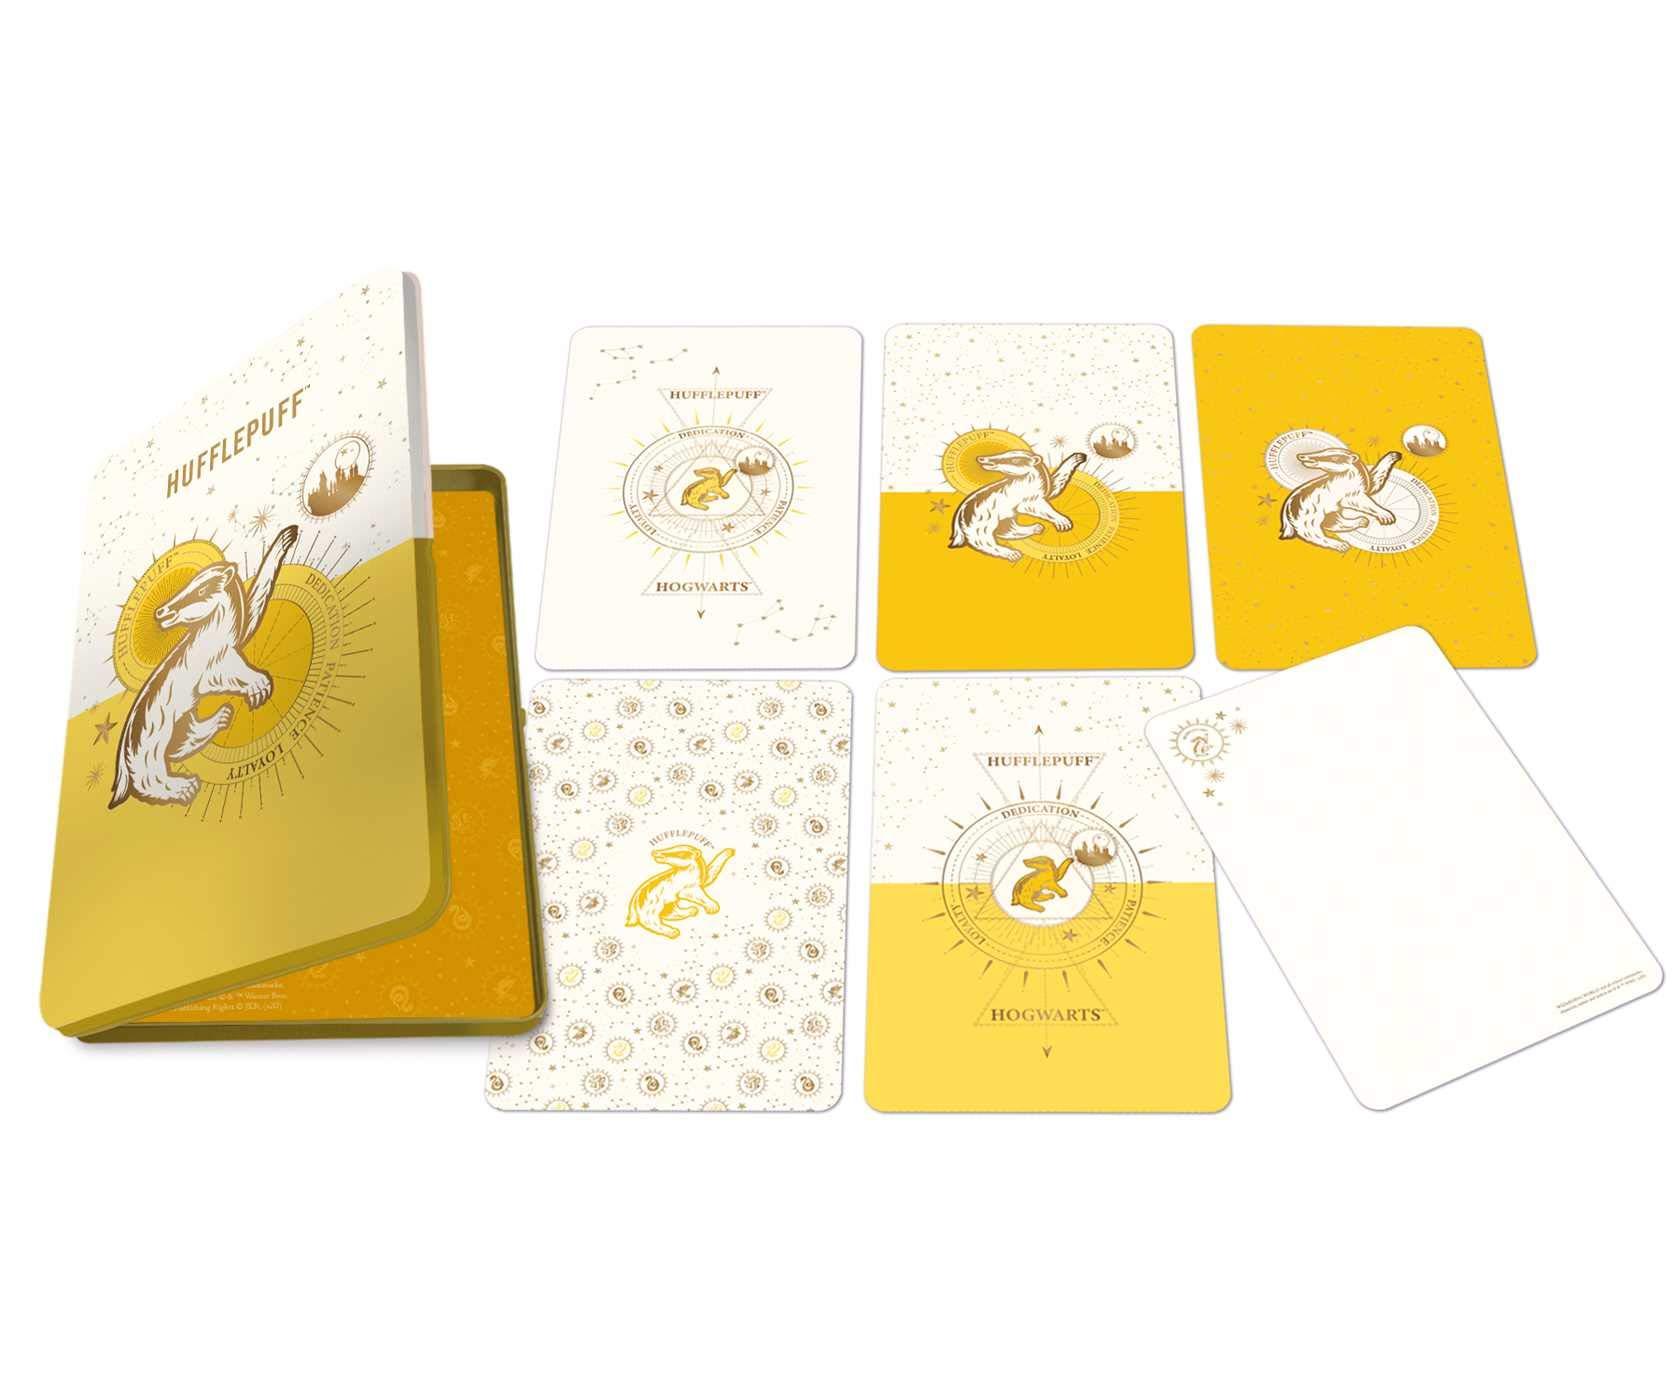 Set 20 de carti postale - Harry Potter - Hufflepuff